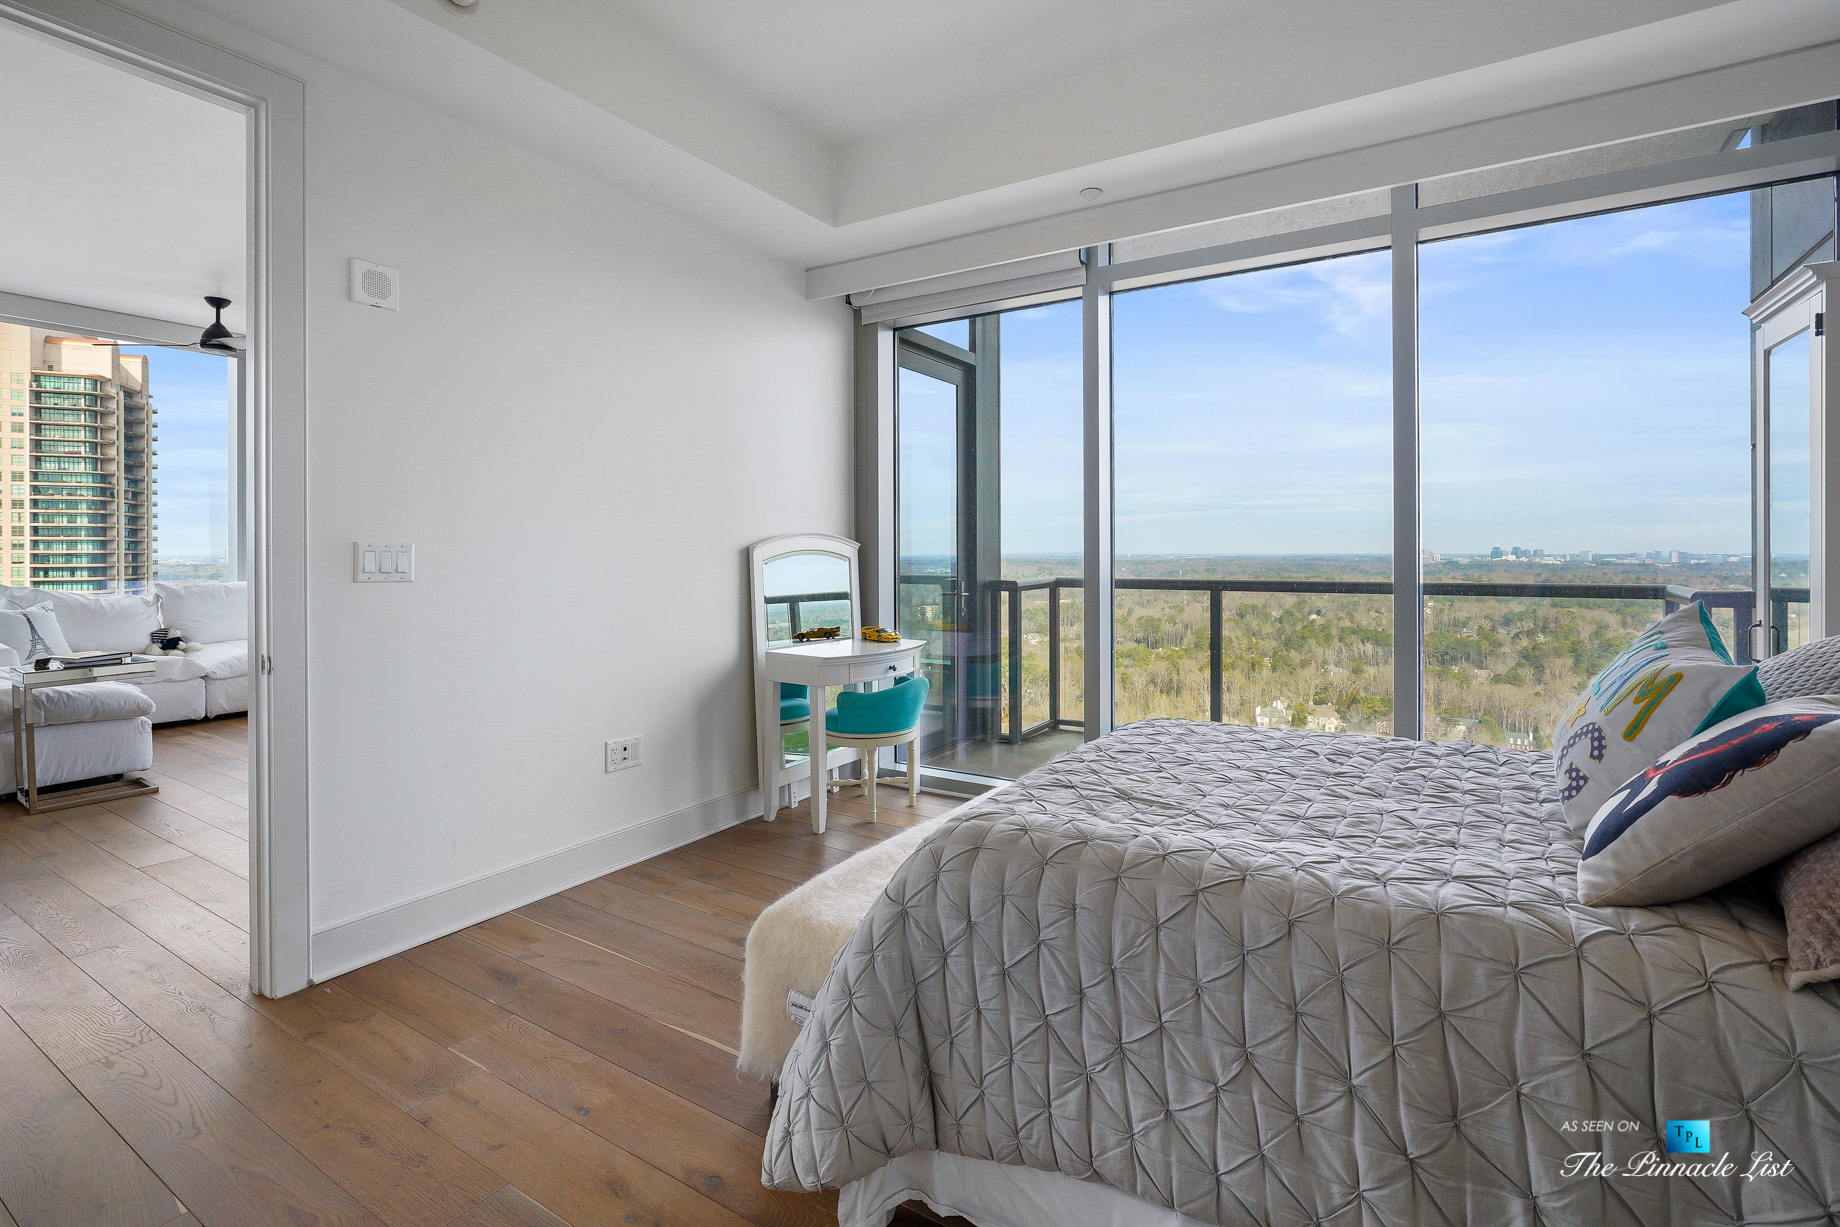 3630 Peachtree Rd NE, Unit 2307, Atlanta, GA, USA – Apartment Bedroom – Luxury Real Estate – Ritz-Carlton Residences Buckhead